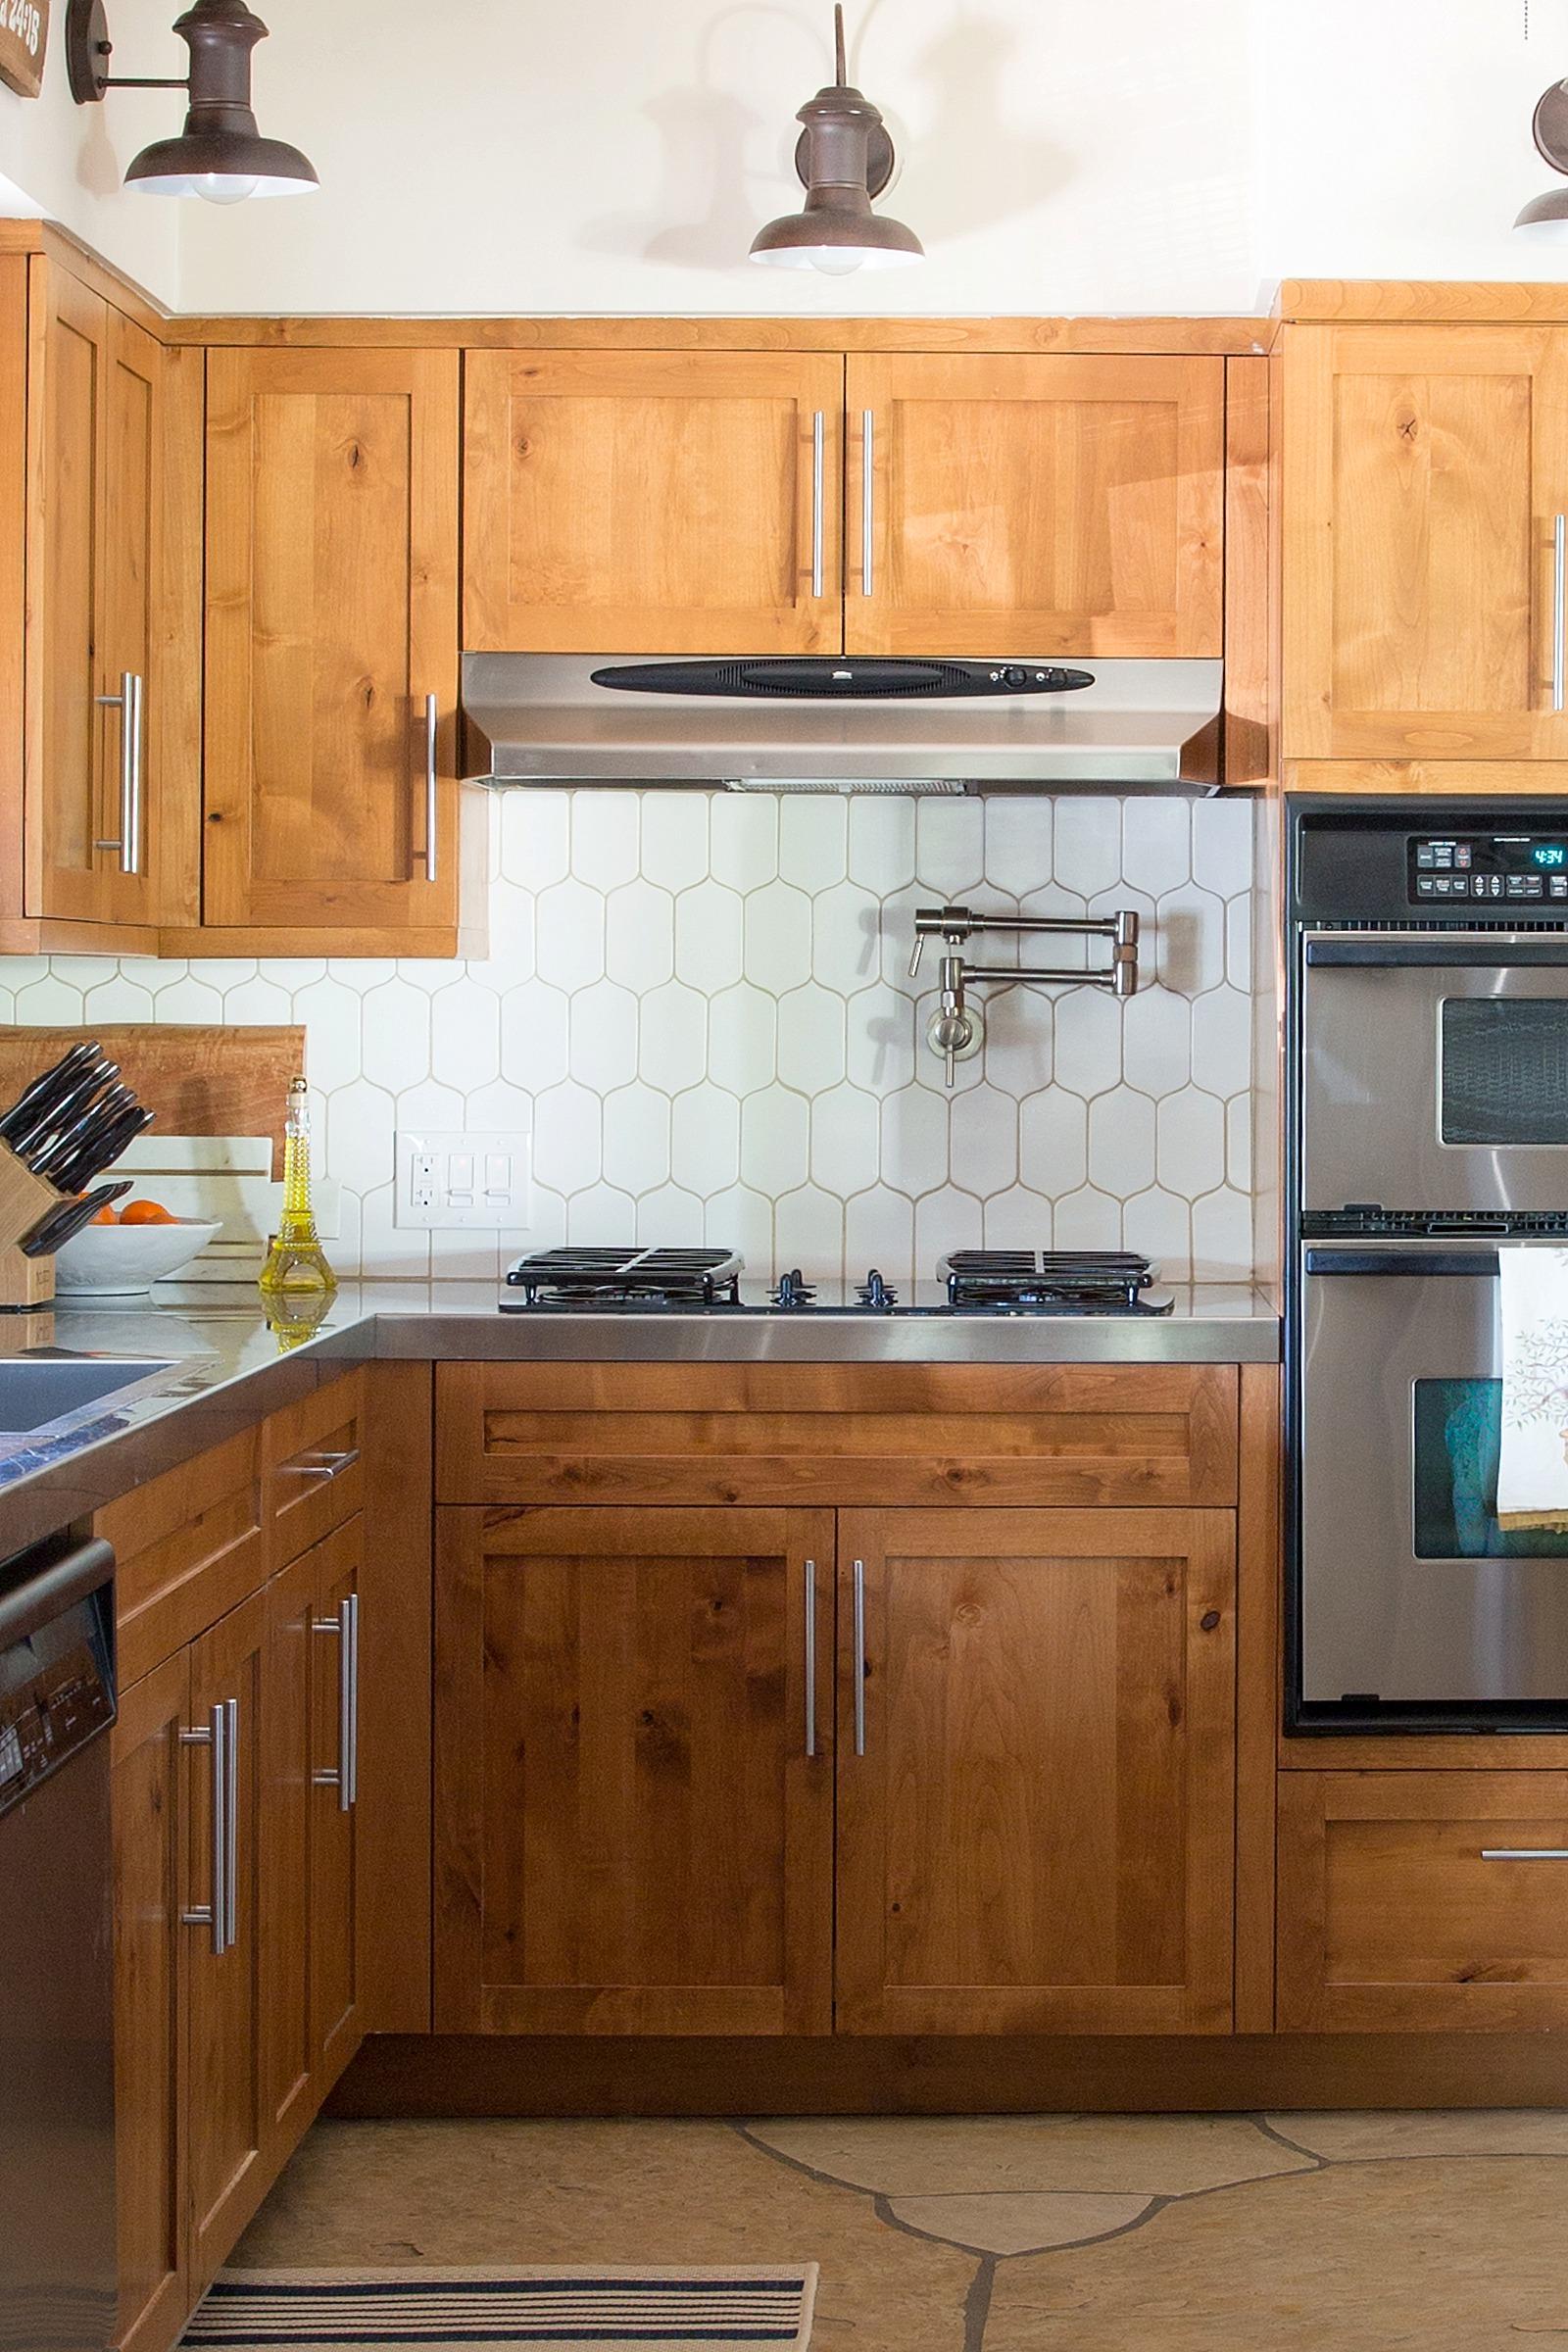 kitchen-diana-elizabeth-photography-blog-build-dot-com-brizo-pot-filler-above-stove-height-install-walker-zanger-cocoon-6th-avenue-mosaic-tile-white-tile-backsplash-9747-2